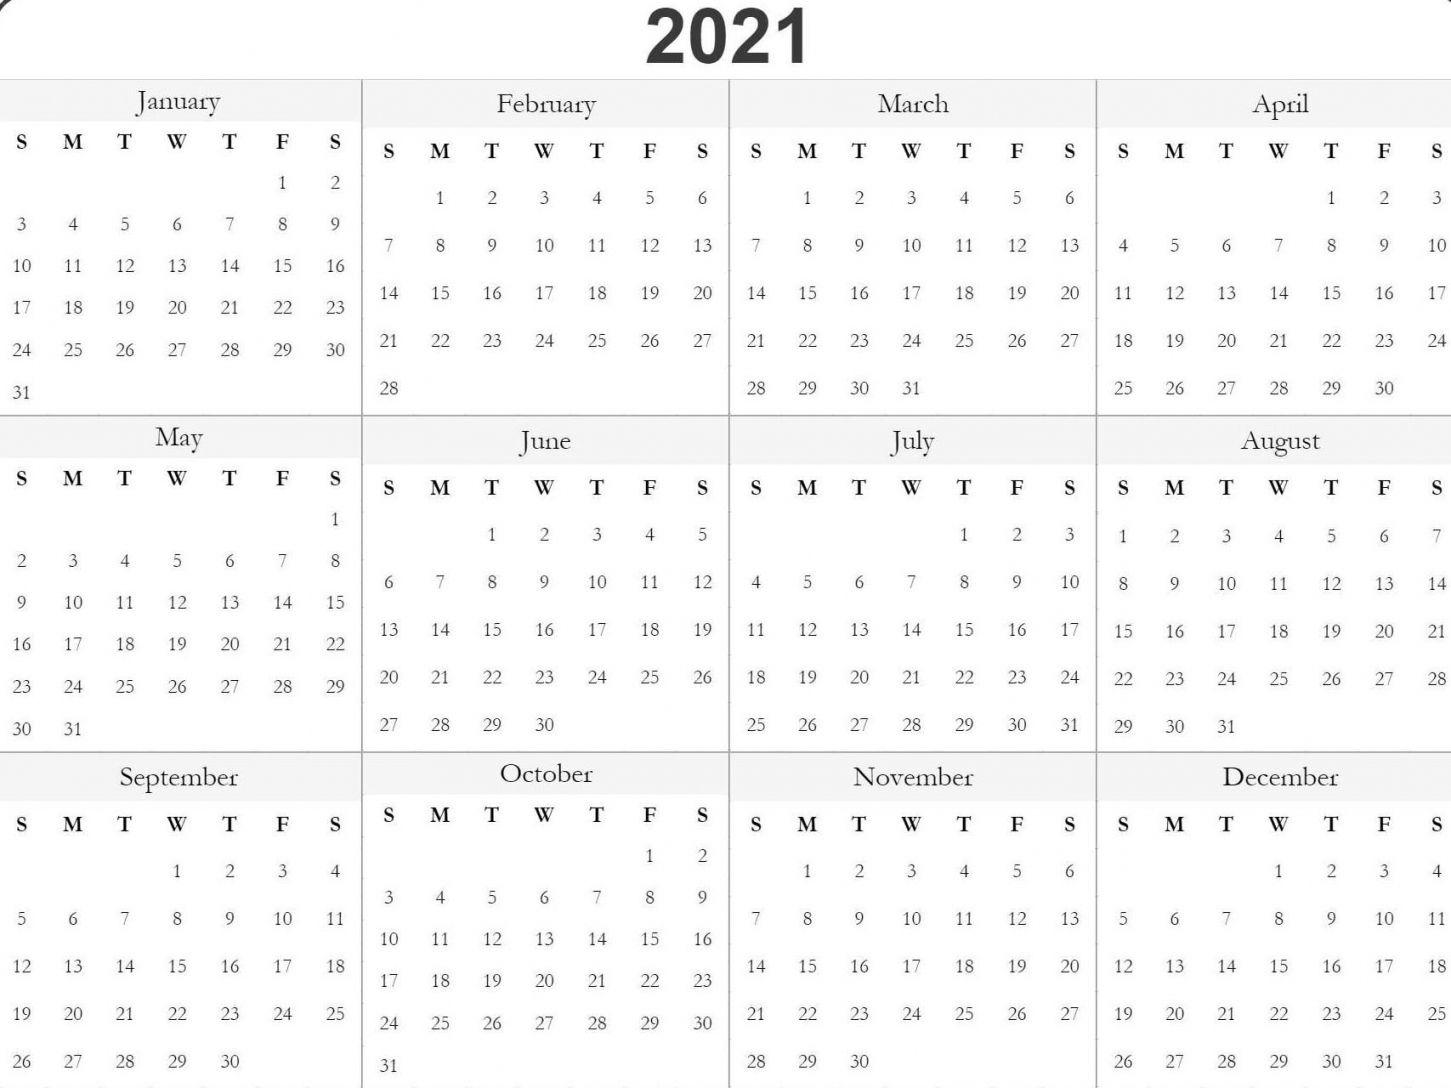 Printable 2021 Julian Date Calendar In 2020 | Free Printable regarding Julian Date Calendar 2021